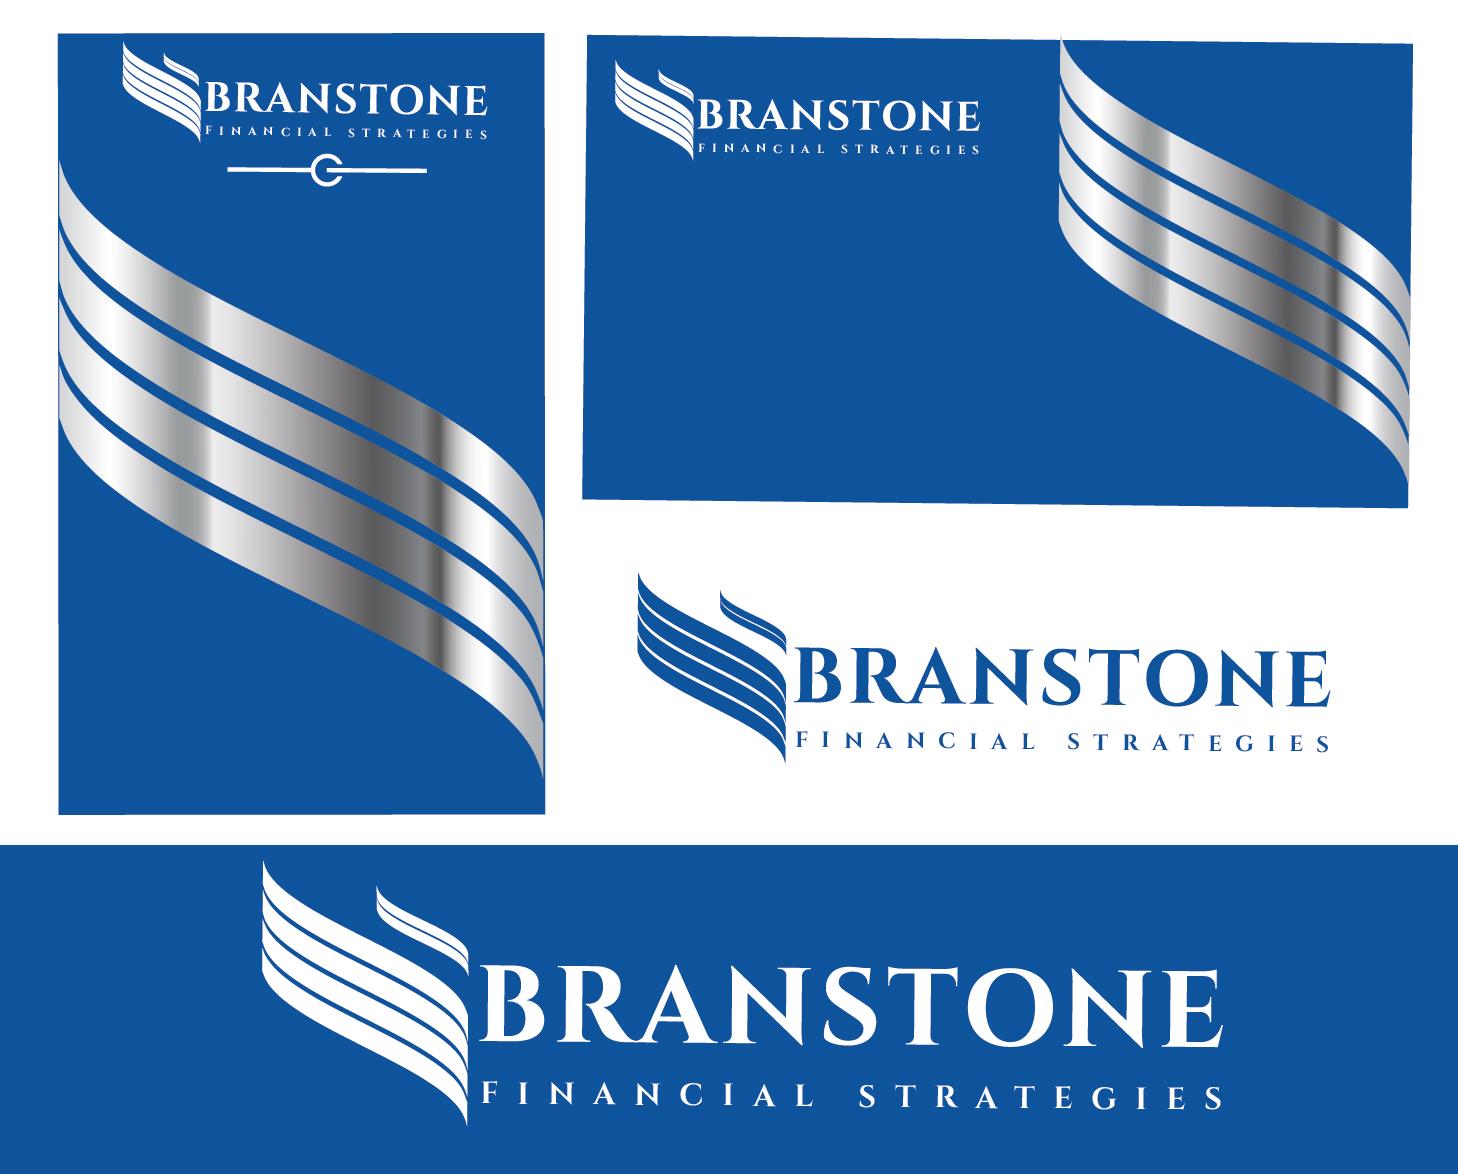 Logo Design by VENTSISLAV KOVACHEV - Entry No. 105 in the Logo Design Contest Inspiring Logo Design for Branstone Financial Strategies.